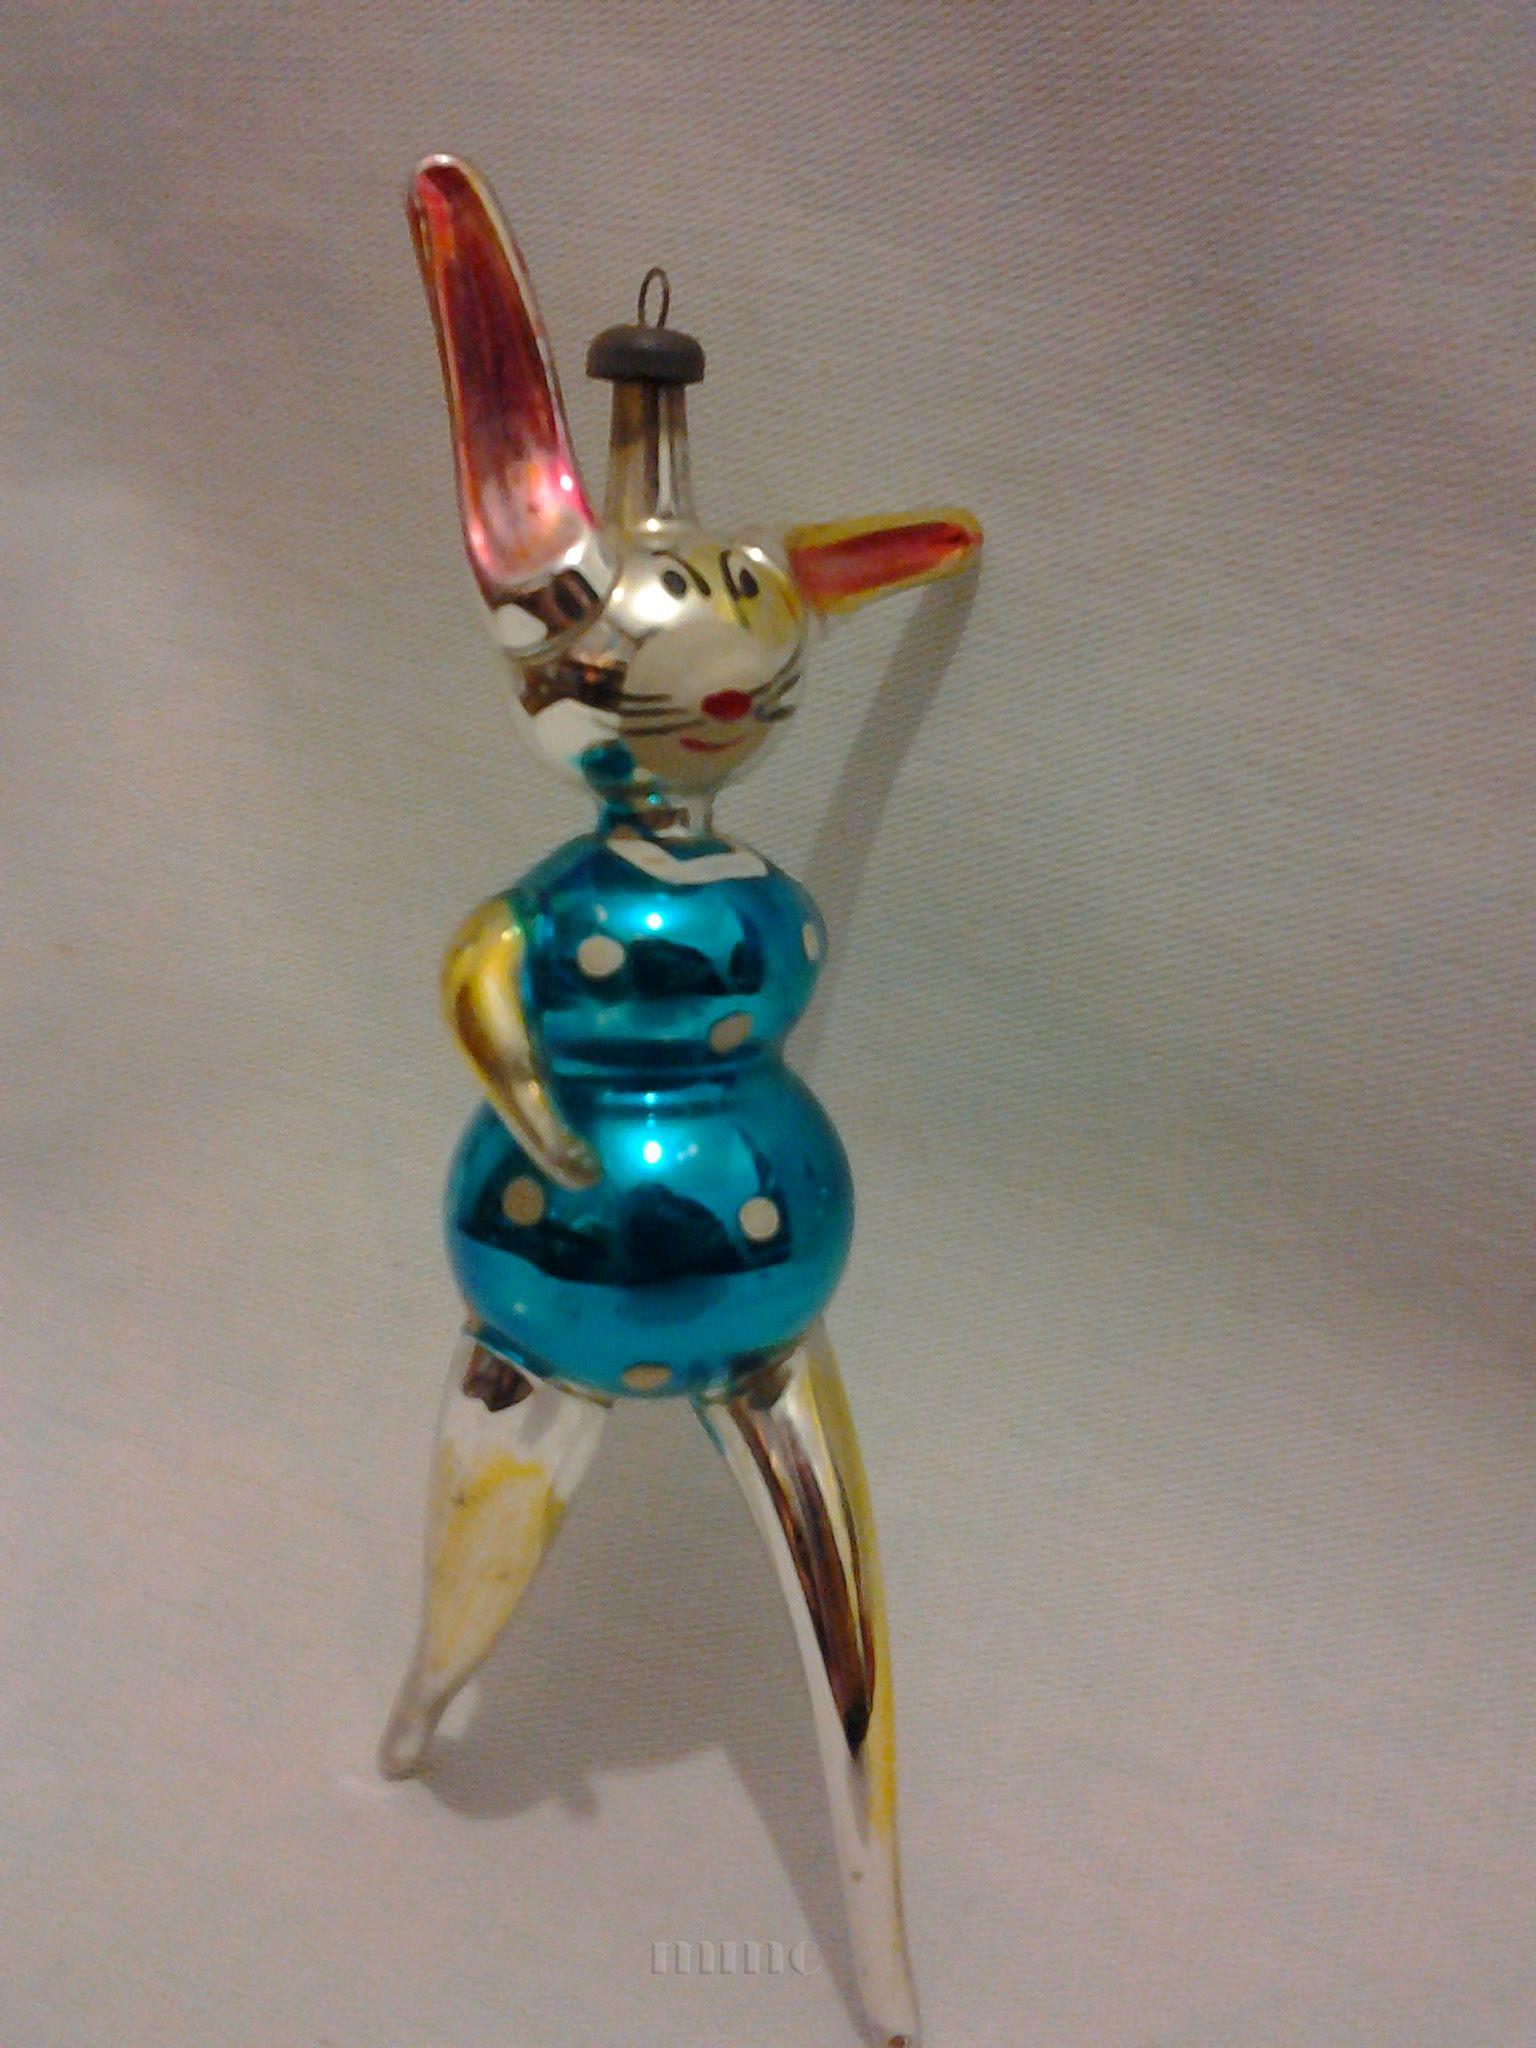 Italian christmas ornaments - Vintage Italian Christmas Ornament Walking Rabbit